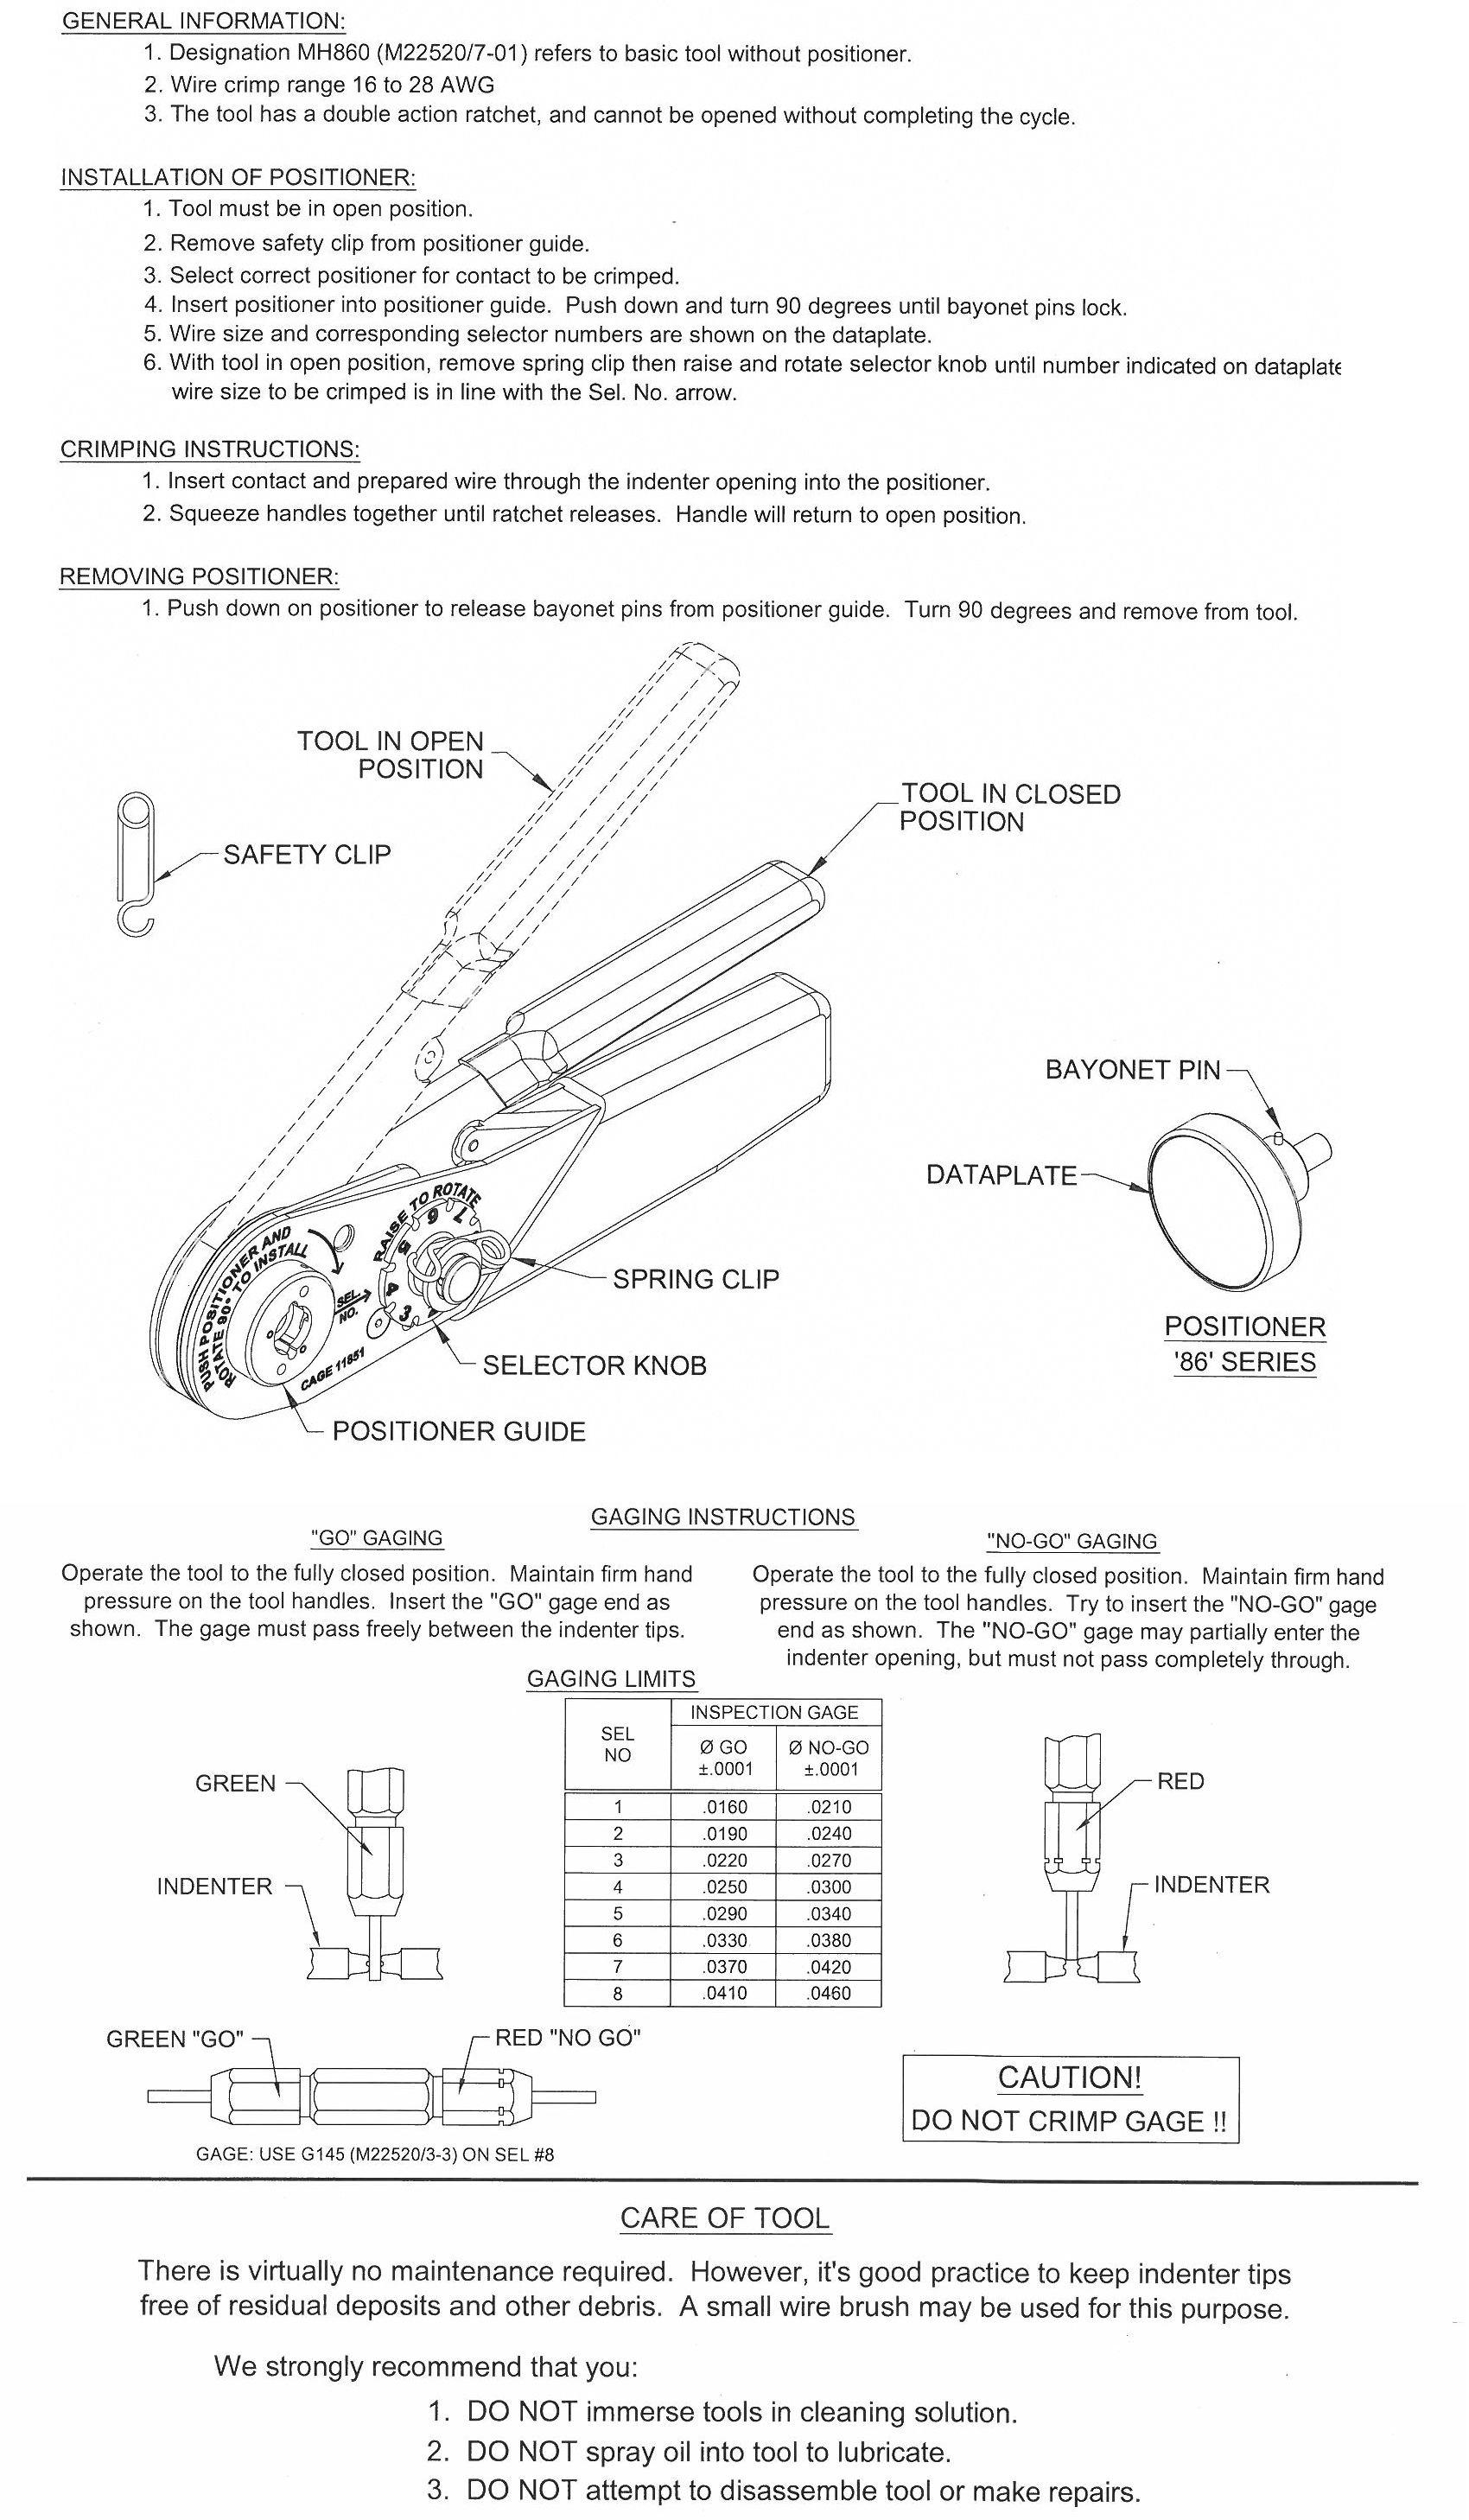 hand tool crimping tool crimpingtool  [ 1700 x 2916 Pixel ]